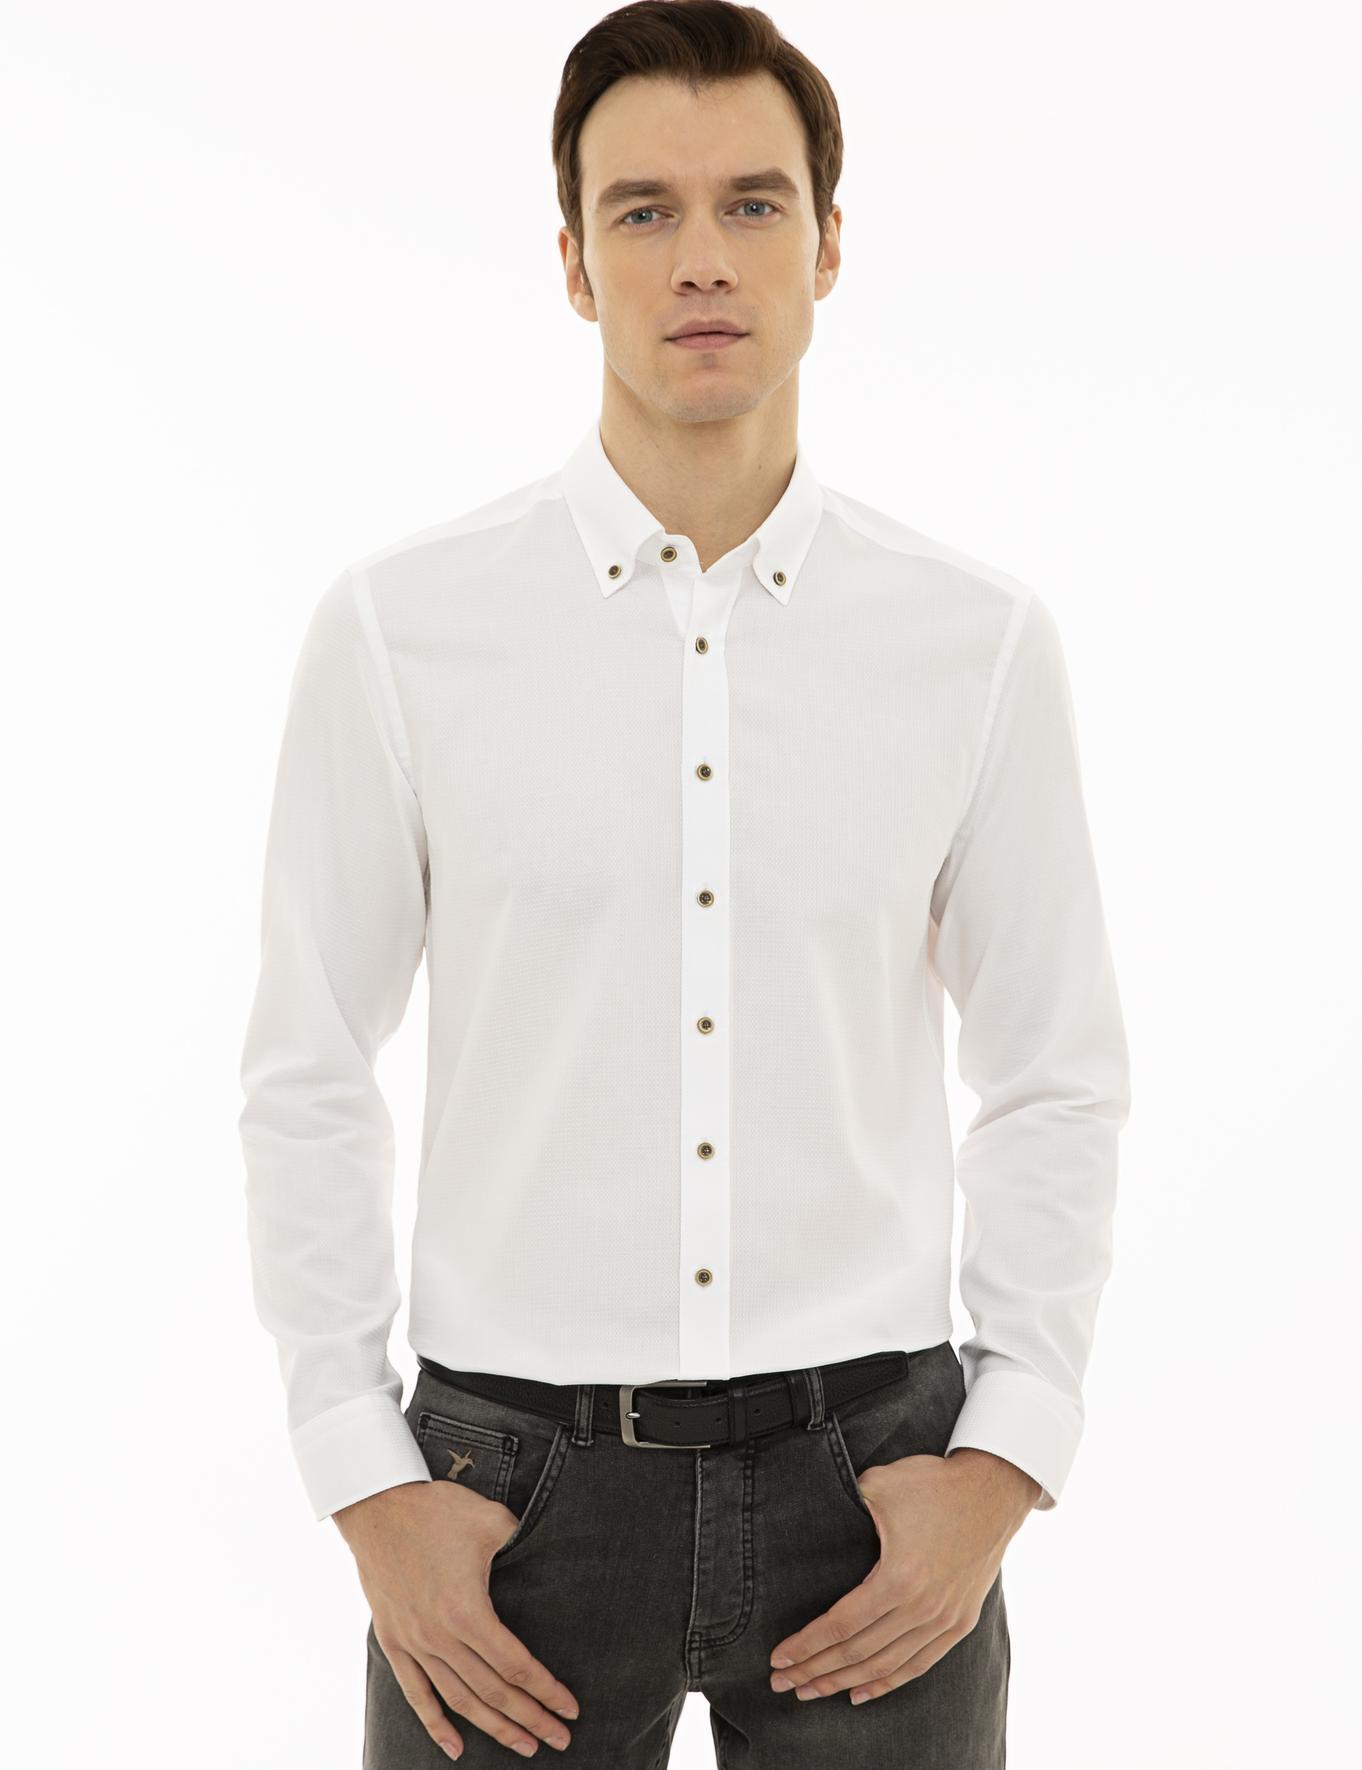 Beyaz Slim Fit Gömlek - 50227926068